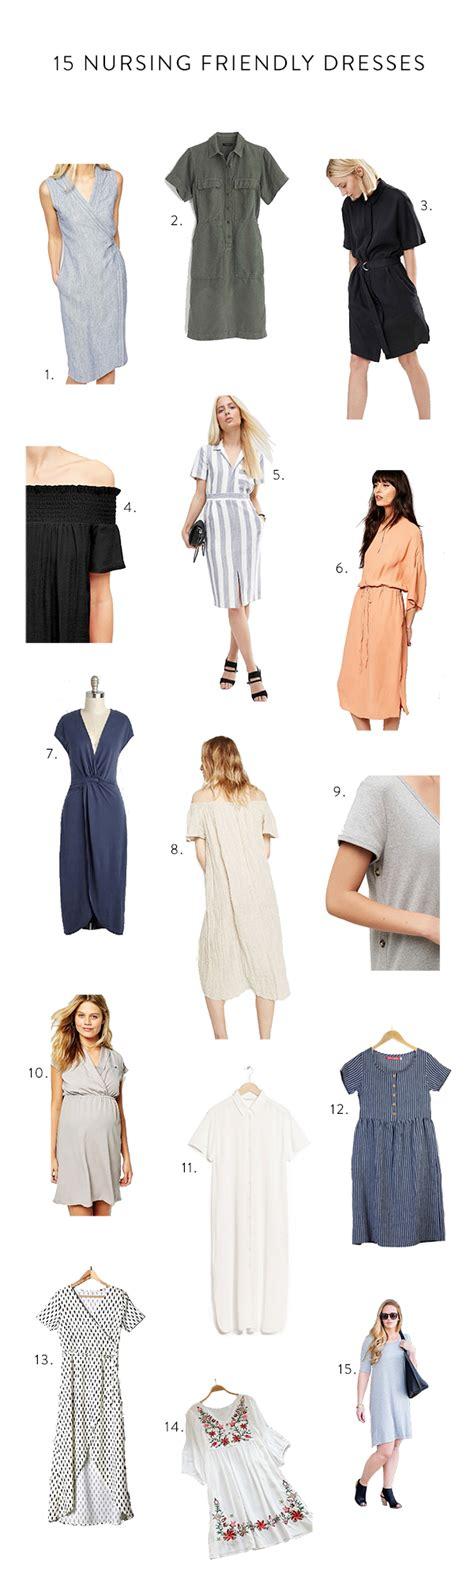 Friendly Summer Dresses - 15 nursing friendly summer dresses say yes